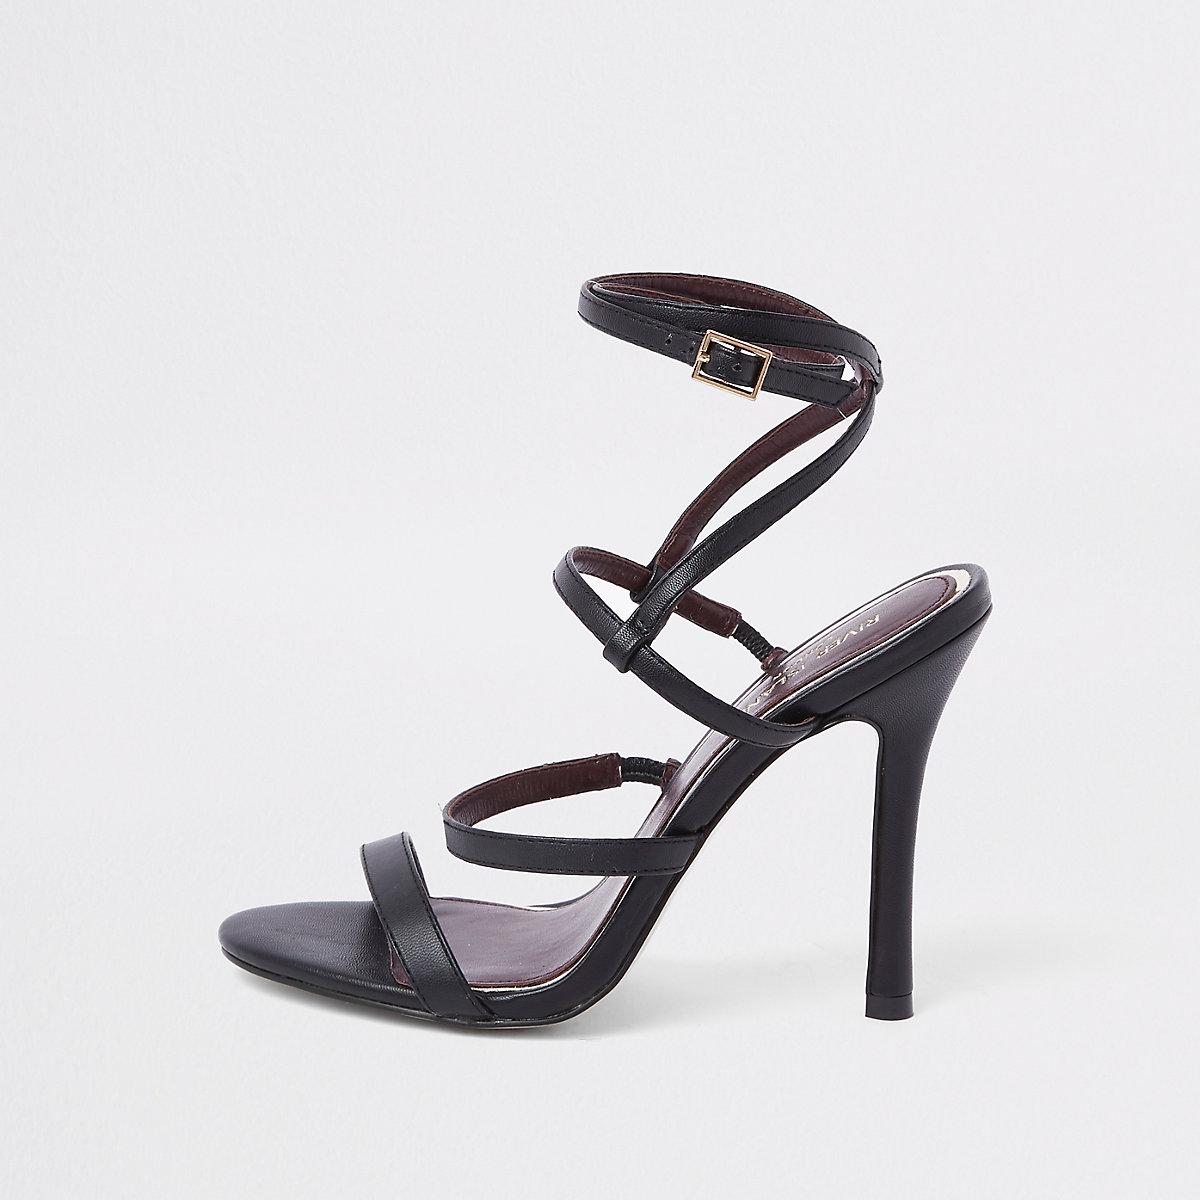 Black strappy skinny heel sandals